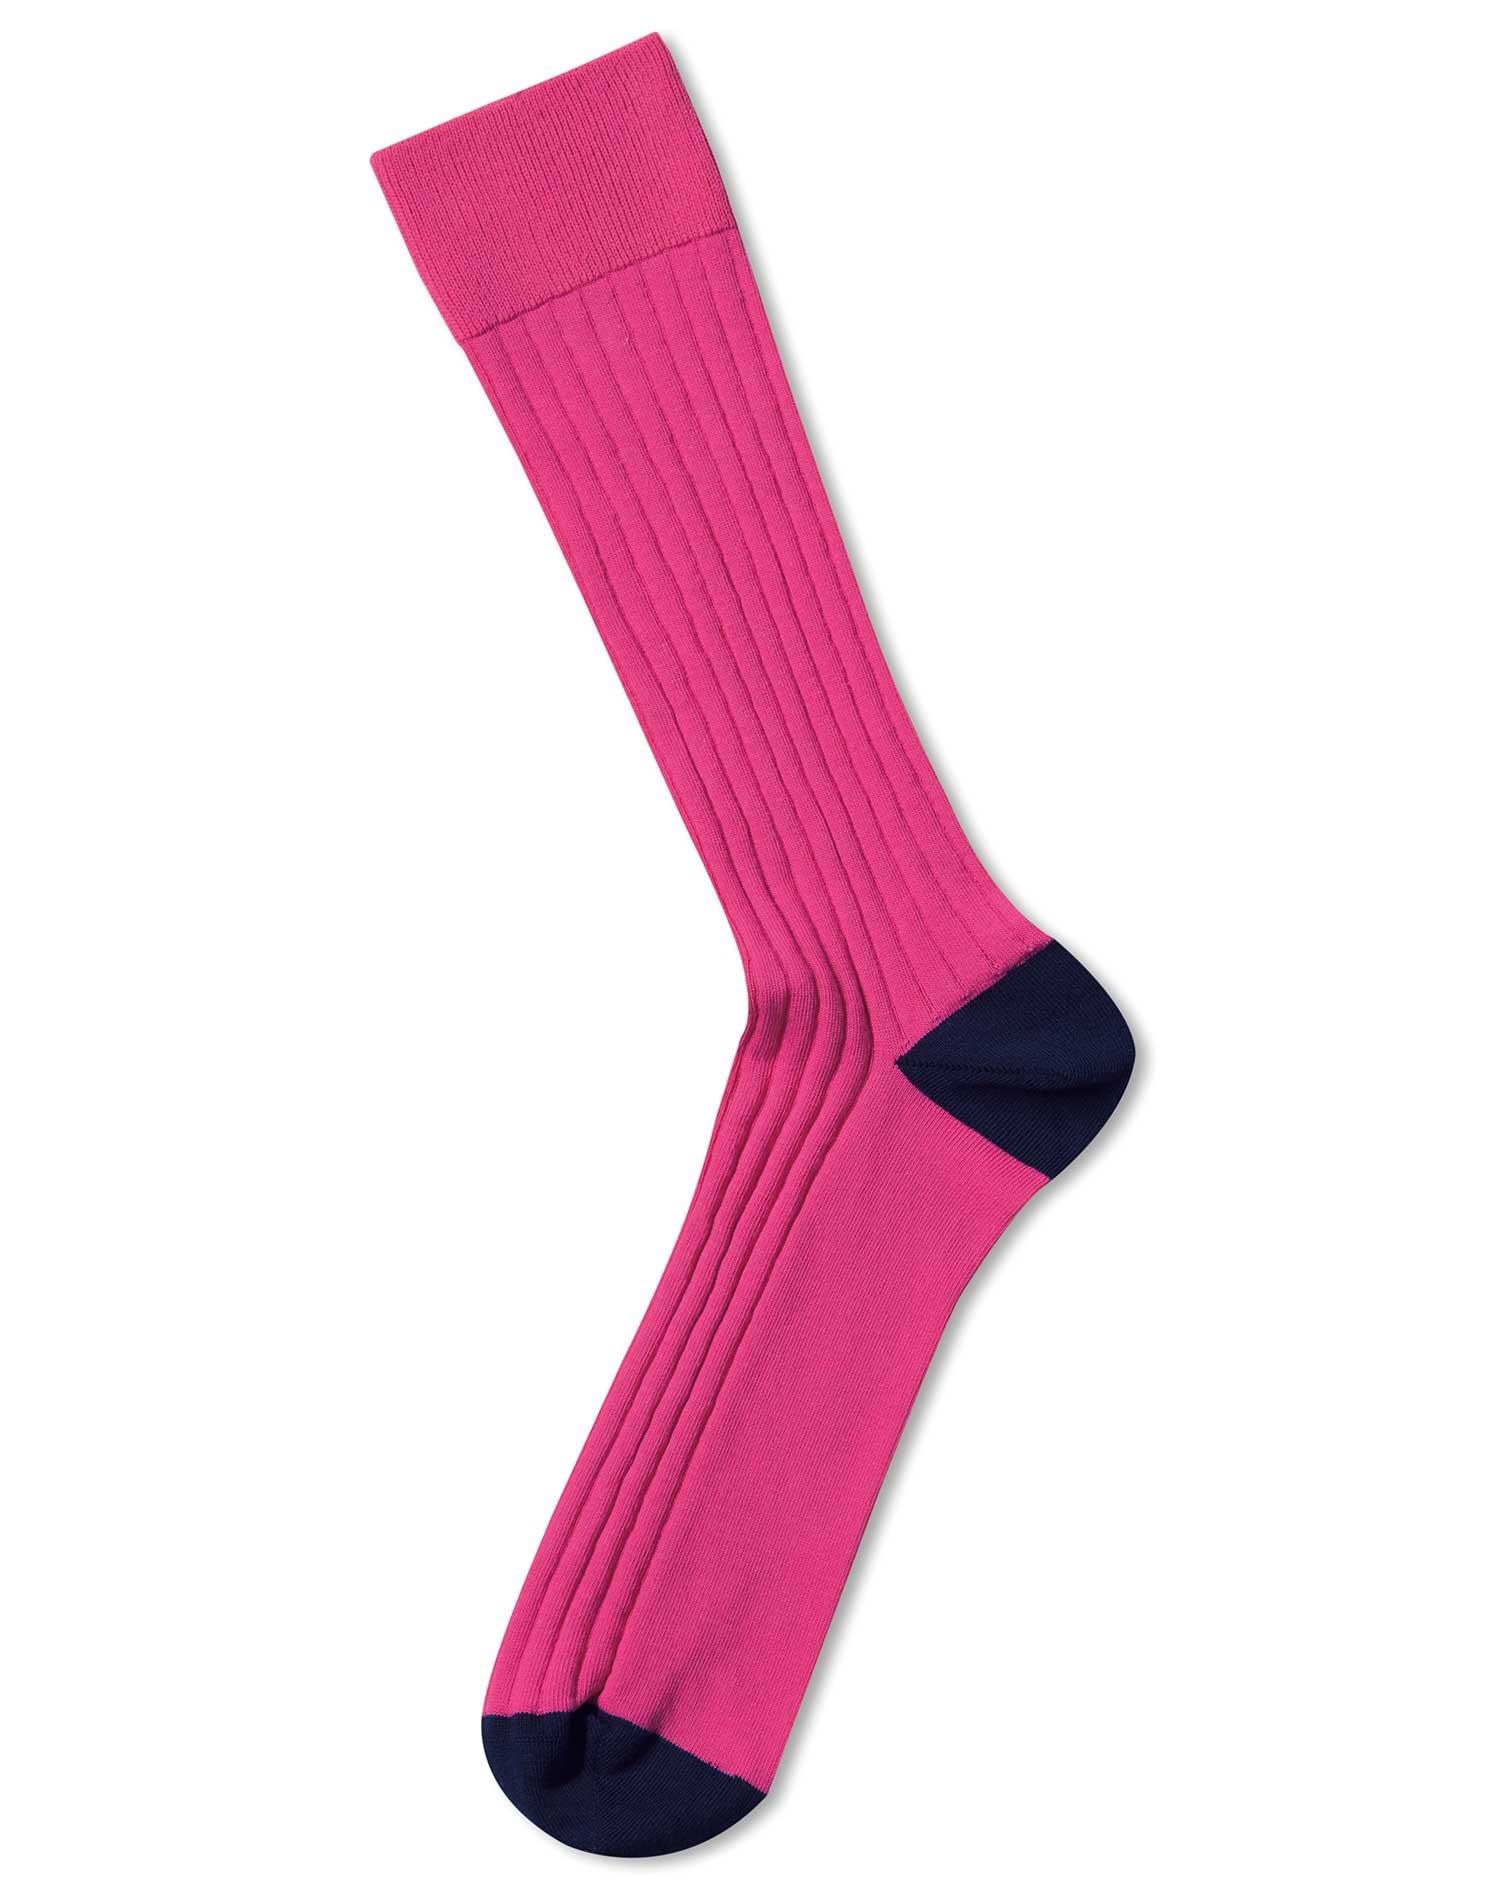 Pink Cotton Rib Socks Size Medium by Charles Tyrwhitt